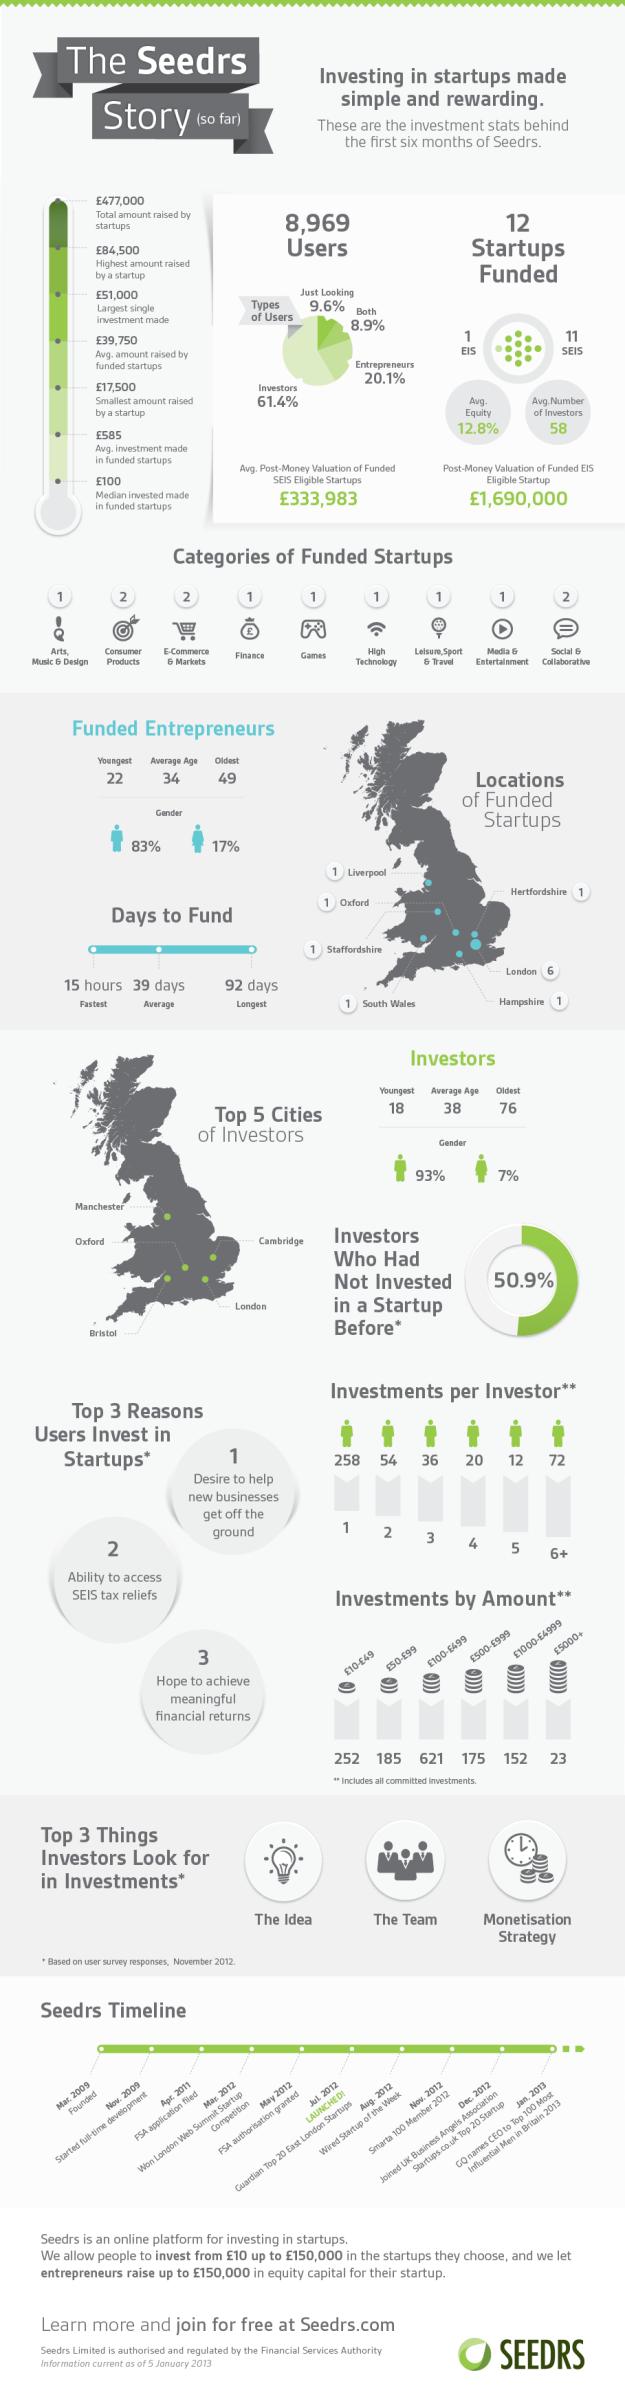 Seedrs Online Startup Investing Jan. 13